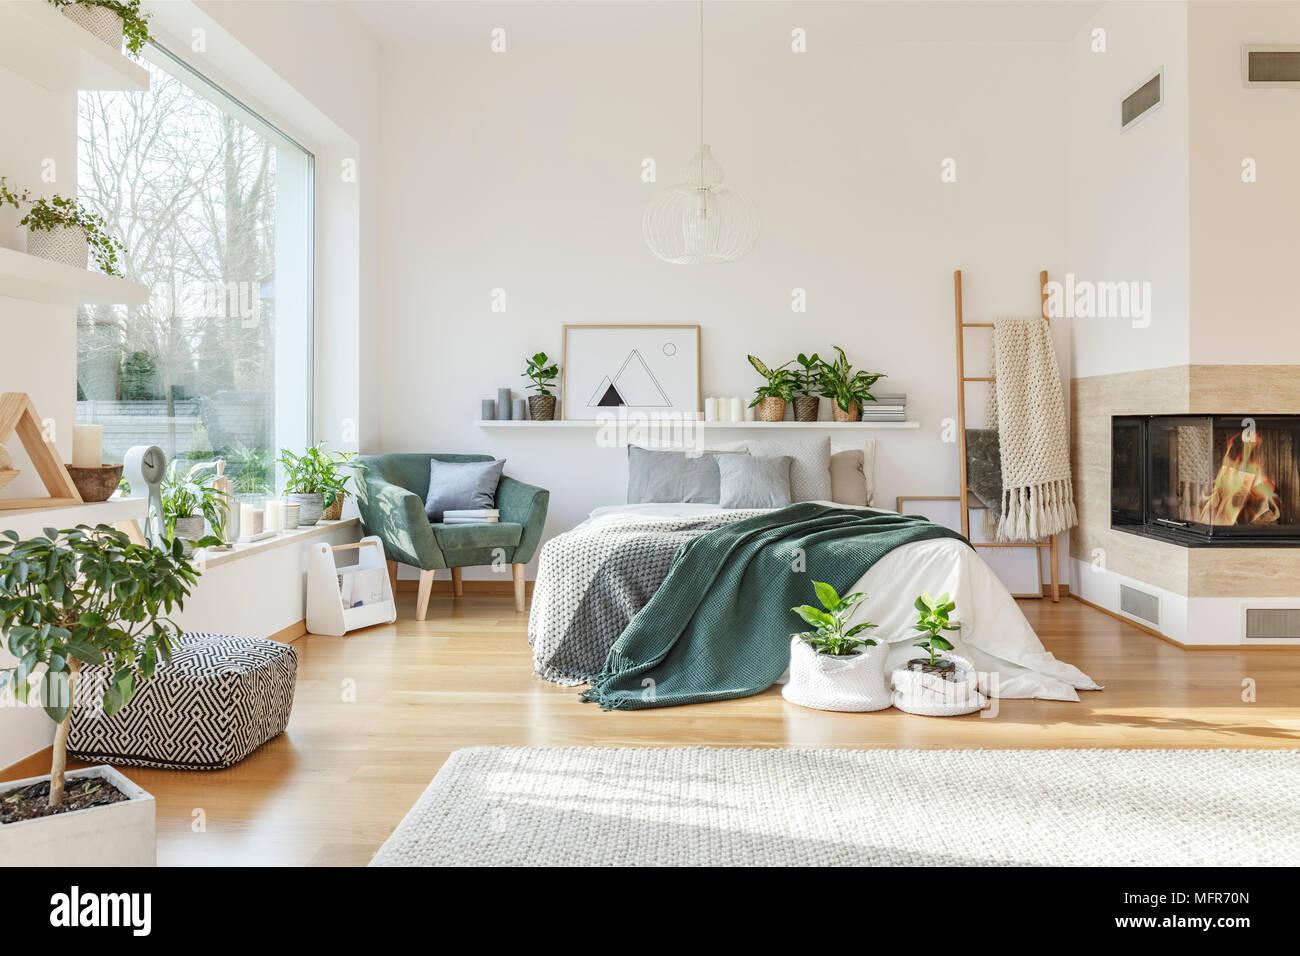 Schlafzimmer Teppich 6294 Made House Decor